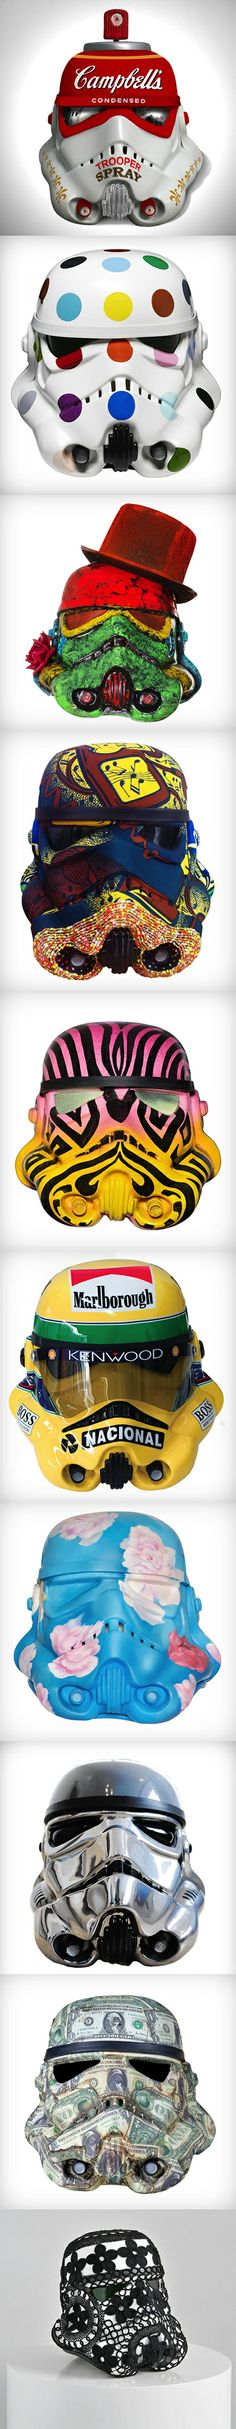 Art Wars: Famous Artists Remix the Famous Star Wars Storm Trooper Helmet (Coming to the London Underground) Read more at http://www.visualnews.com/2013/10/15/art-wars-famous-artists-remix-famous-star-wars-storm-trooper-helmet/#lP2TkzEjE3vZ9SI5.99